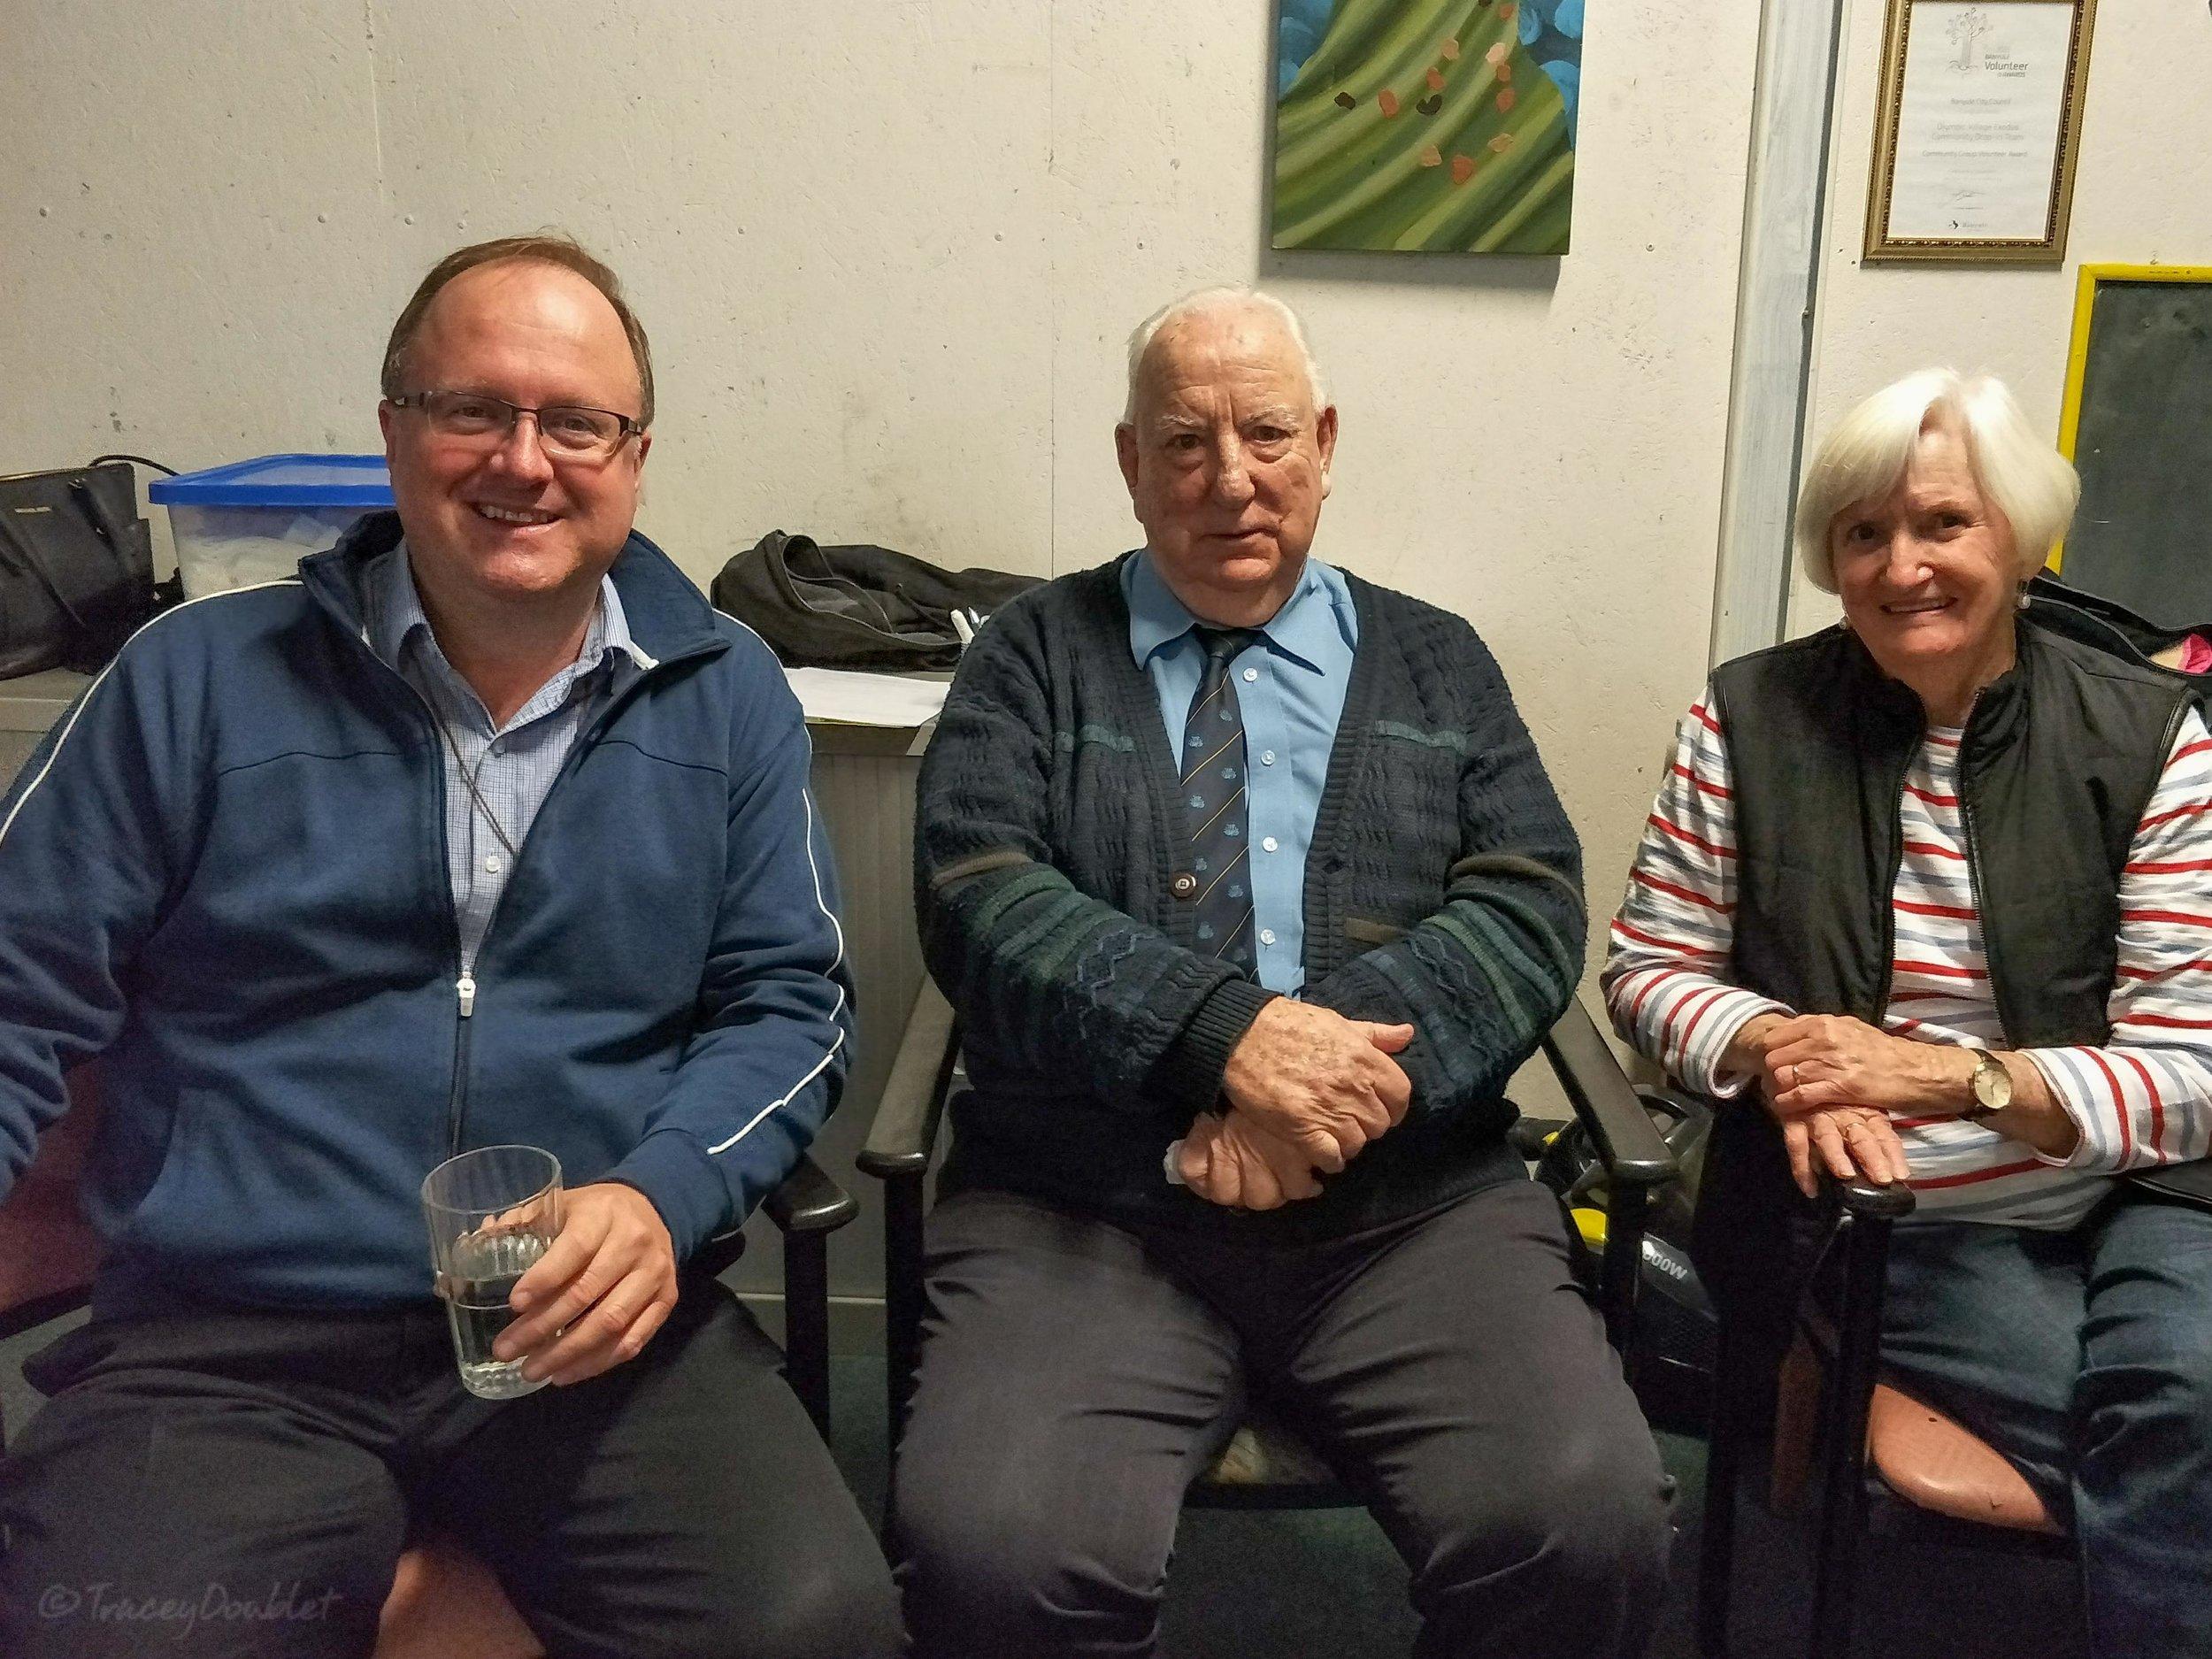 Br Greg, Br Bill, and Maureen